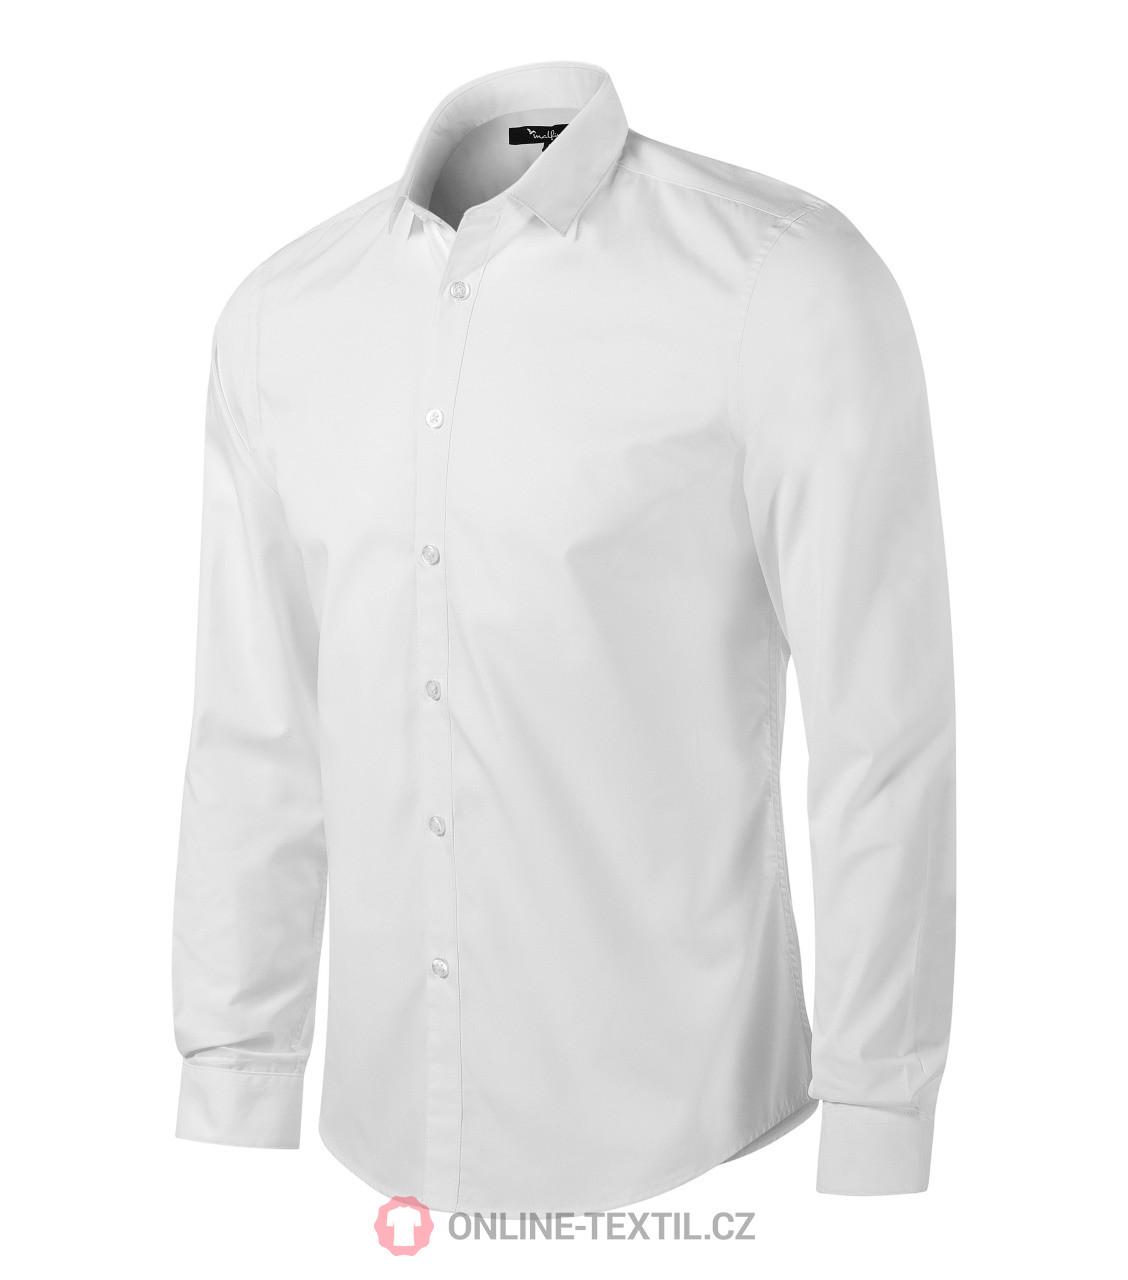 ADLER CZECH Pánská košile Malfini Premium Dynamic 262 - bílá z ... 269dea05fc